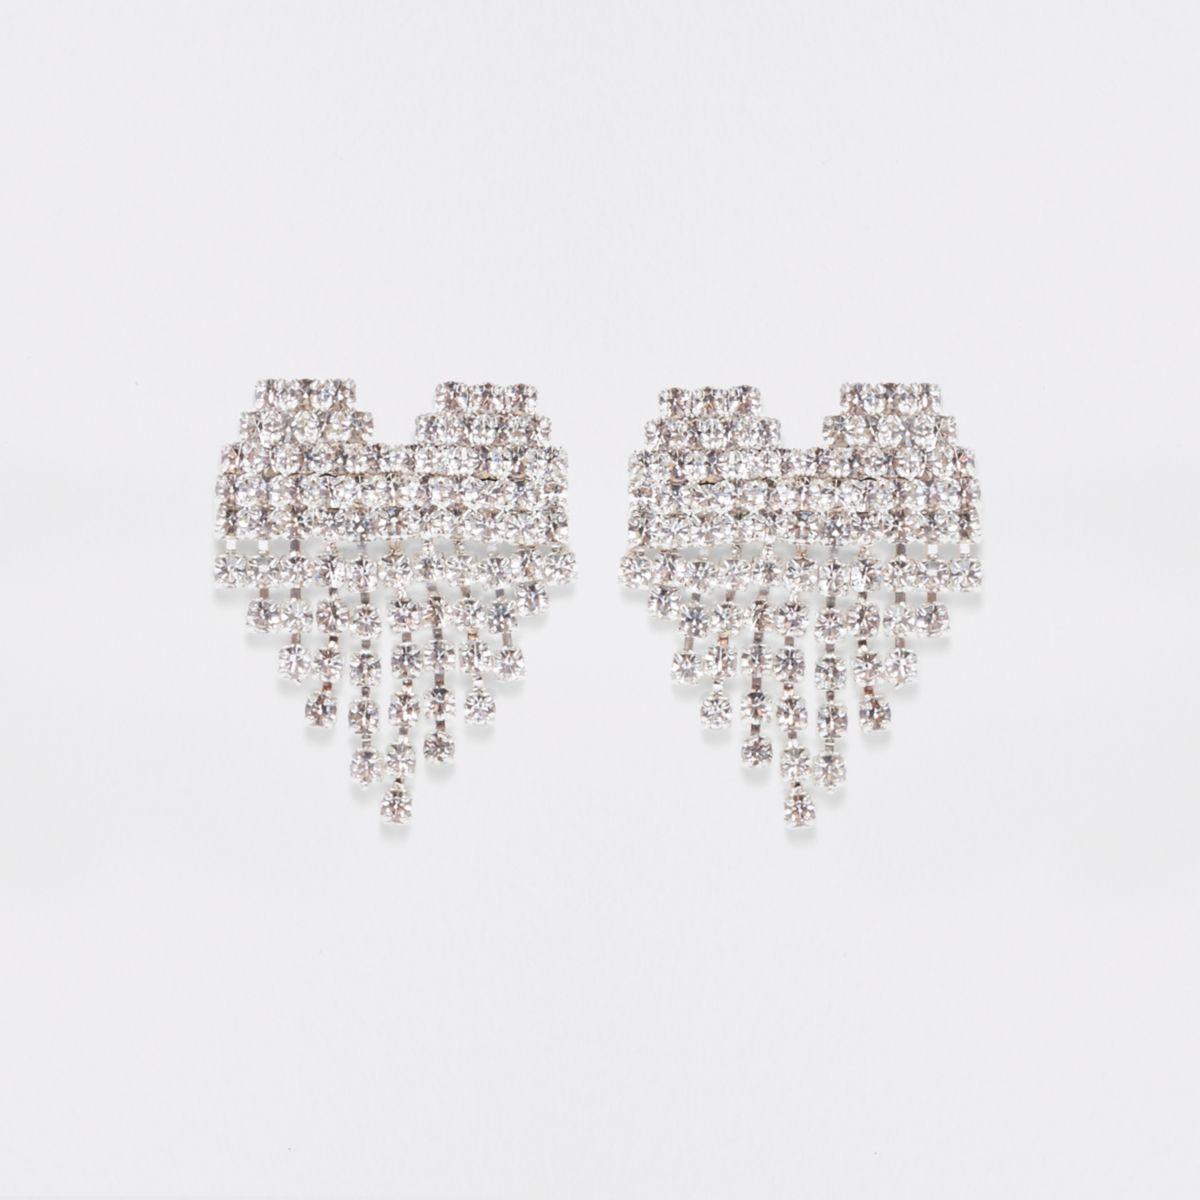 Silver tone rhinestone cup chain heart earrings